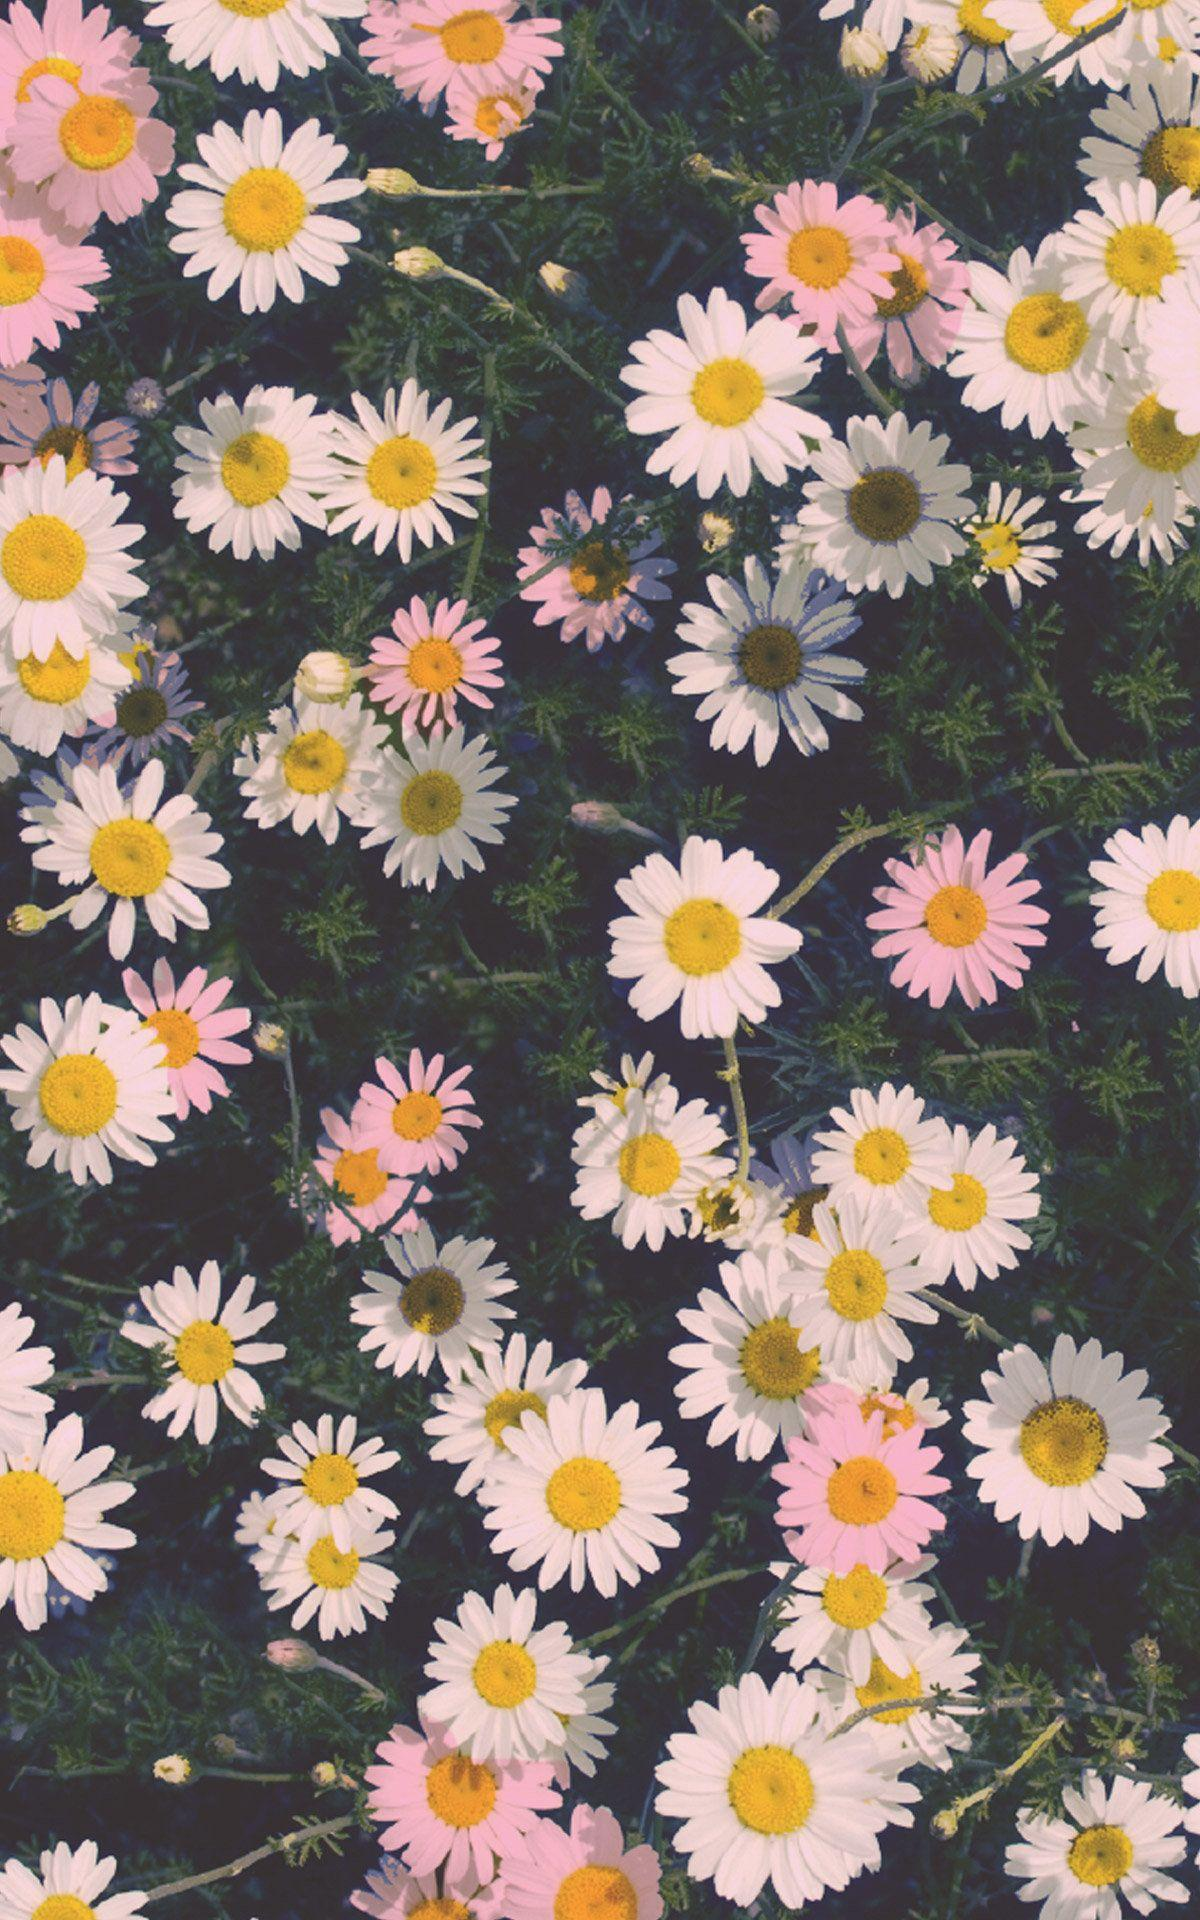 4k Flower Iphone X Wallpapers Wallpaper Cave